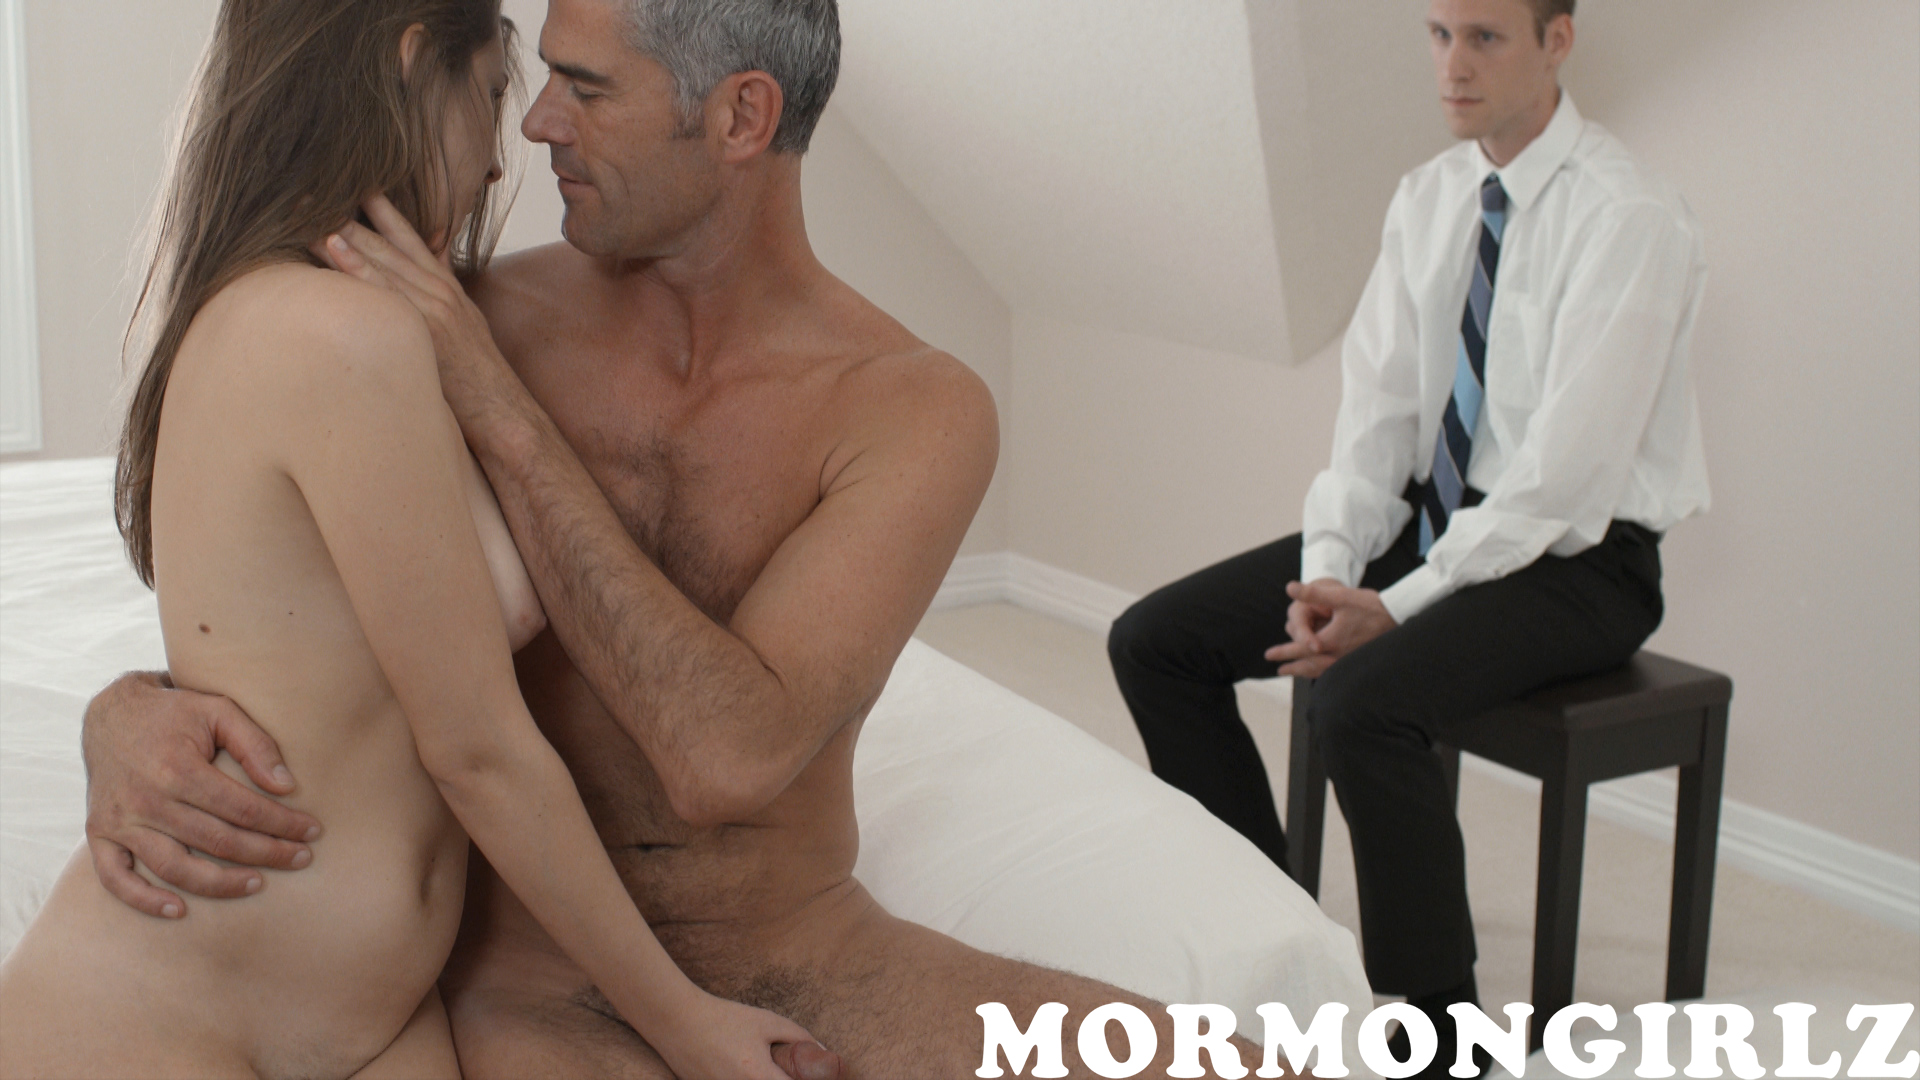 076_mormongirlz_0029